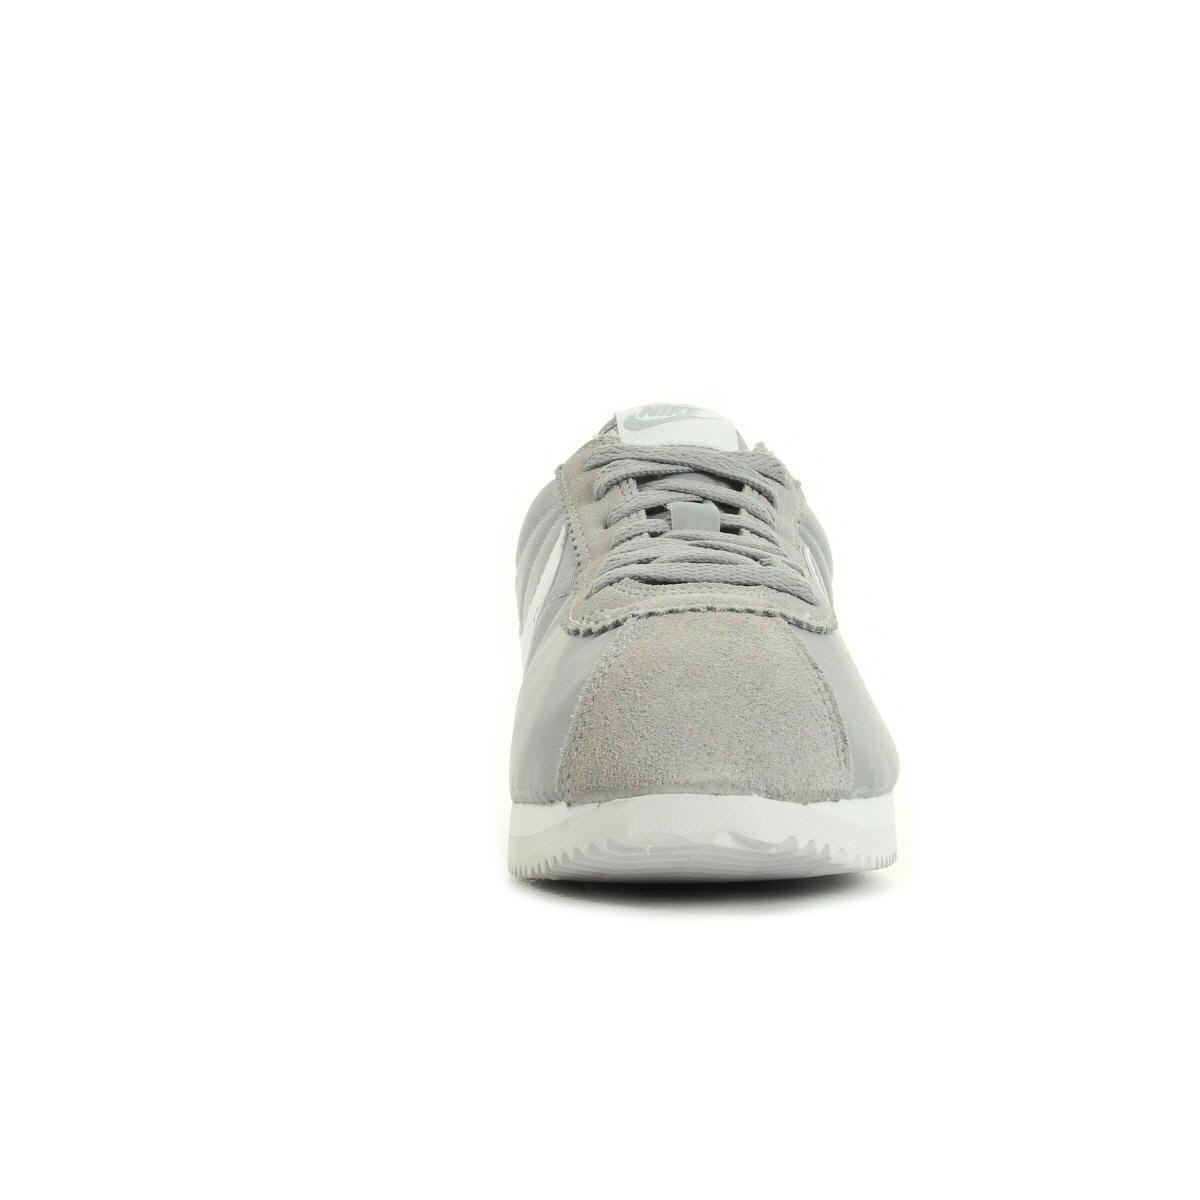 Nike Classic Cortez Nylon 807472010, Baskets mode